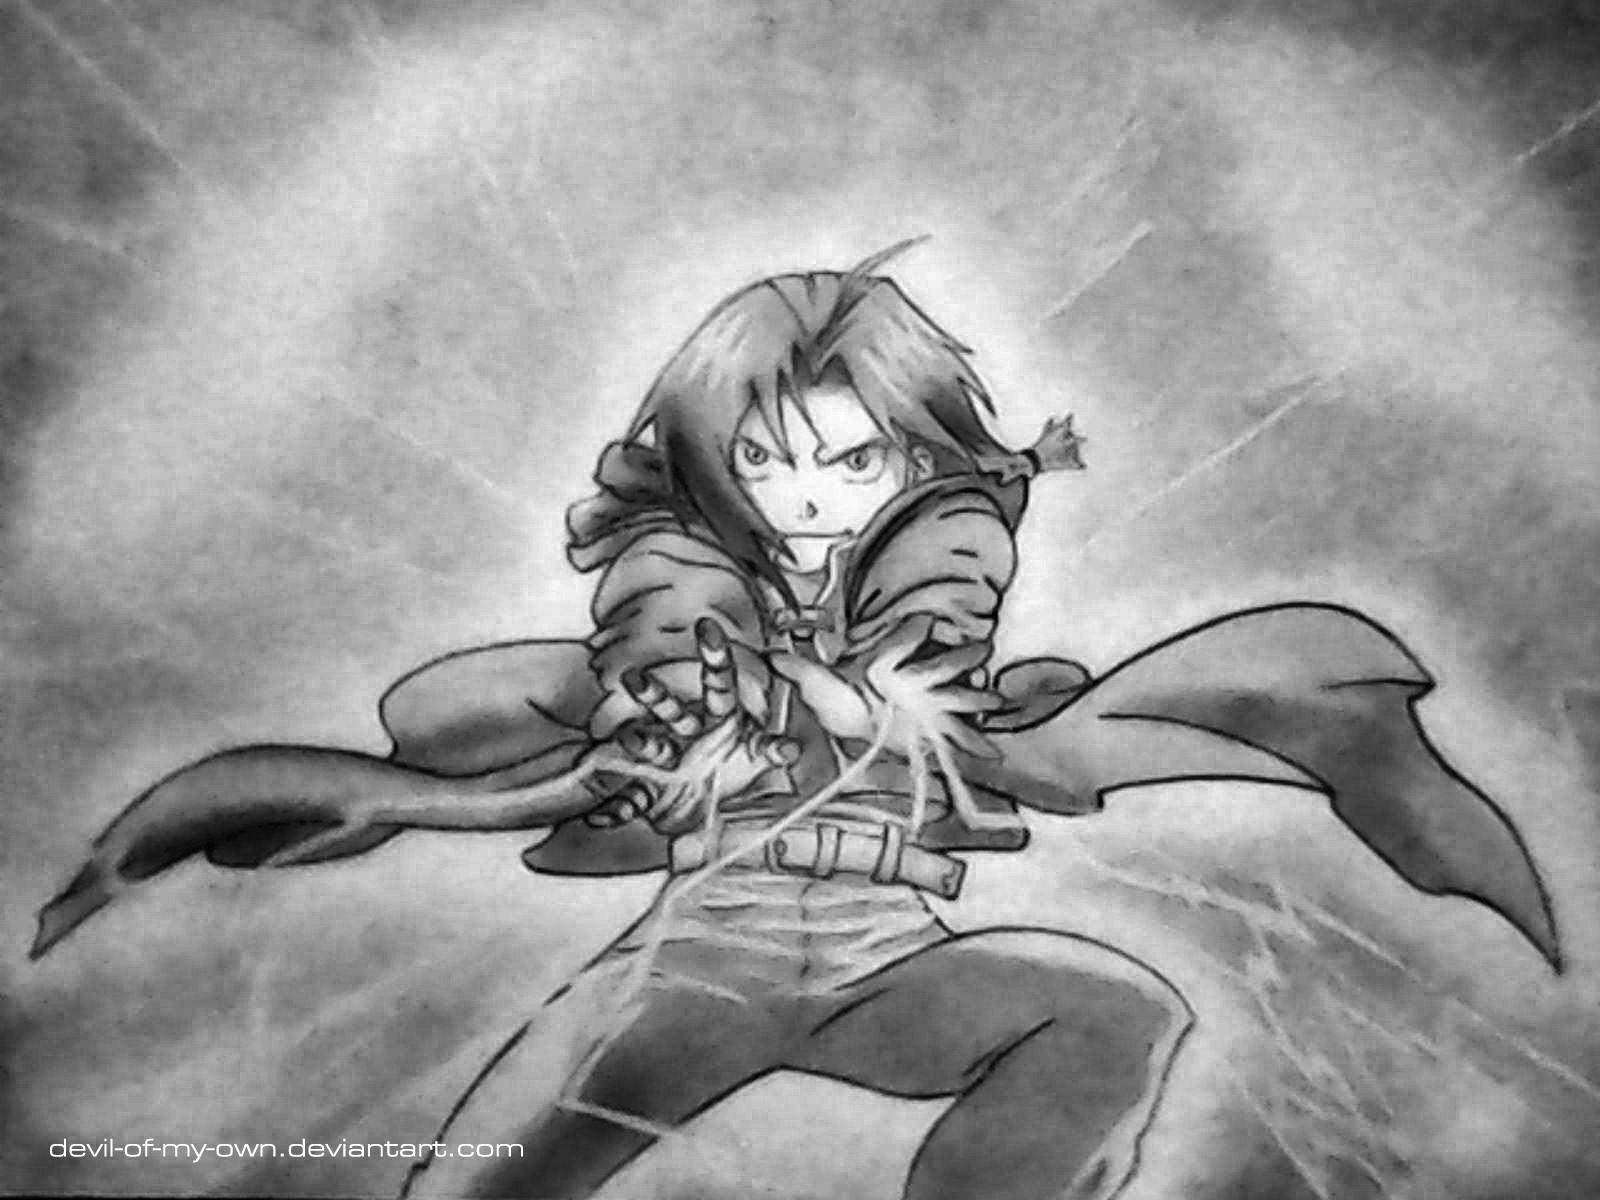 Edward Elric - Full Metal Alchemist by devil-of-my-own